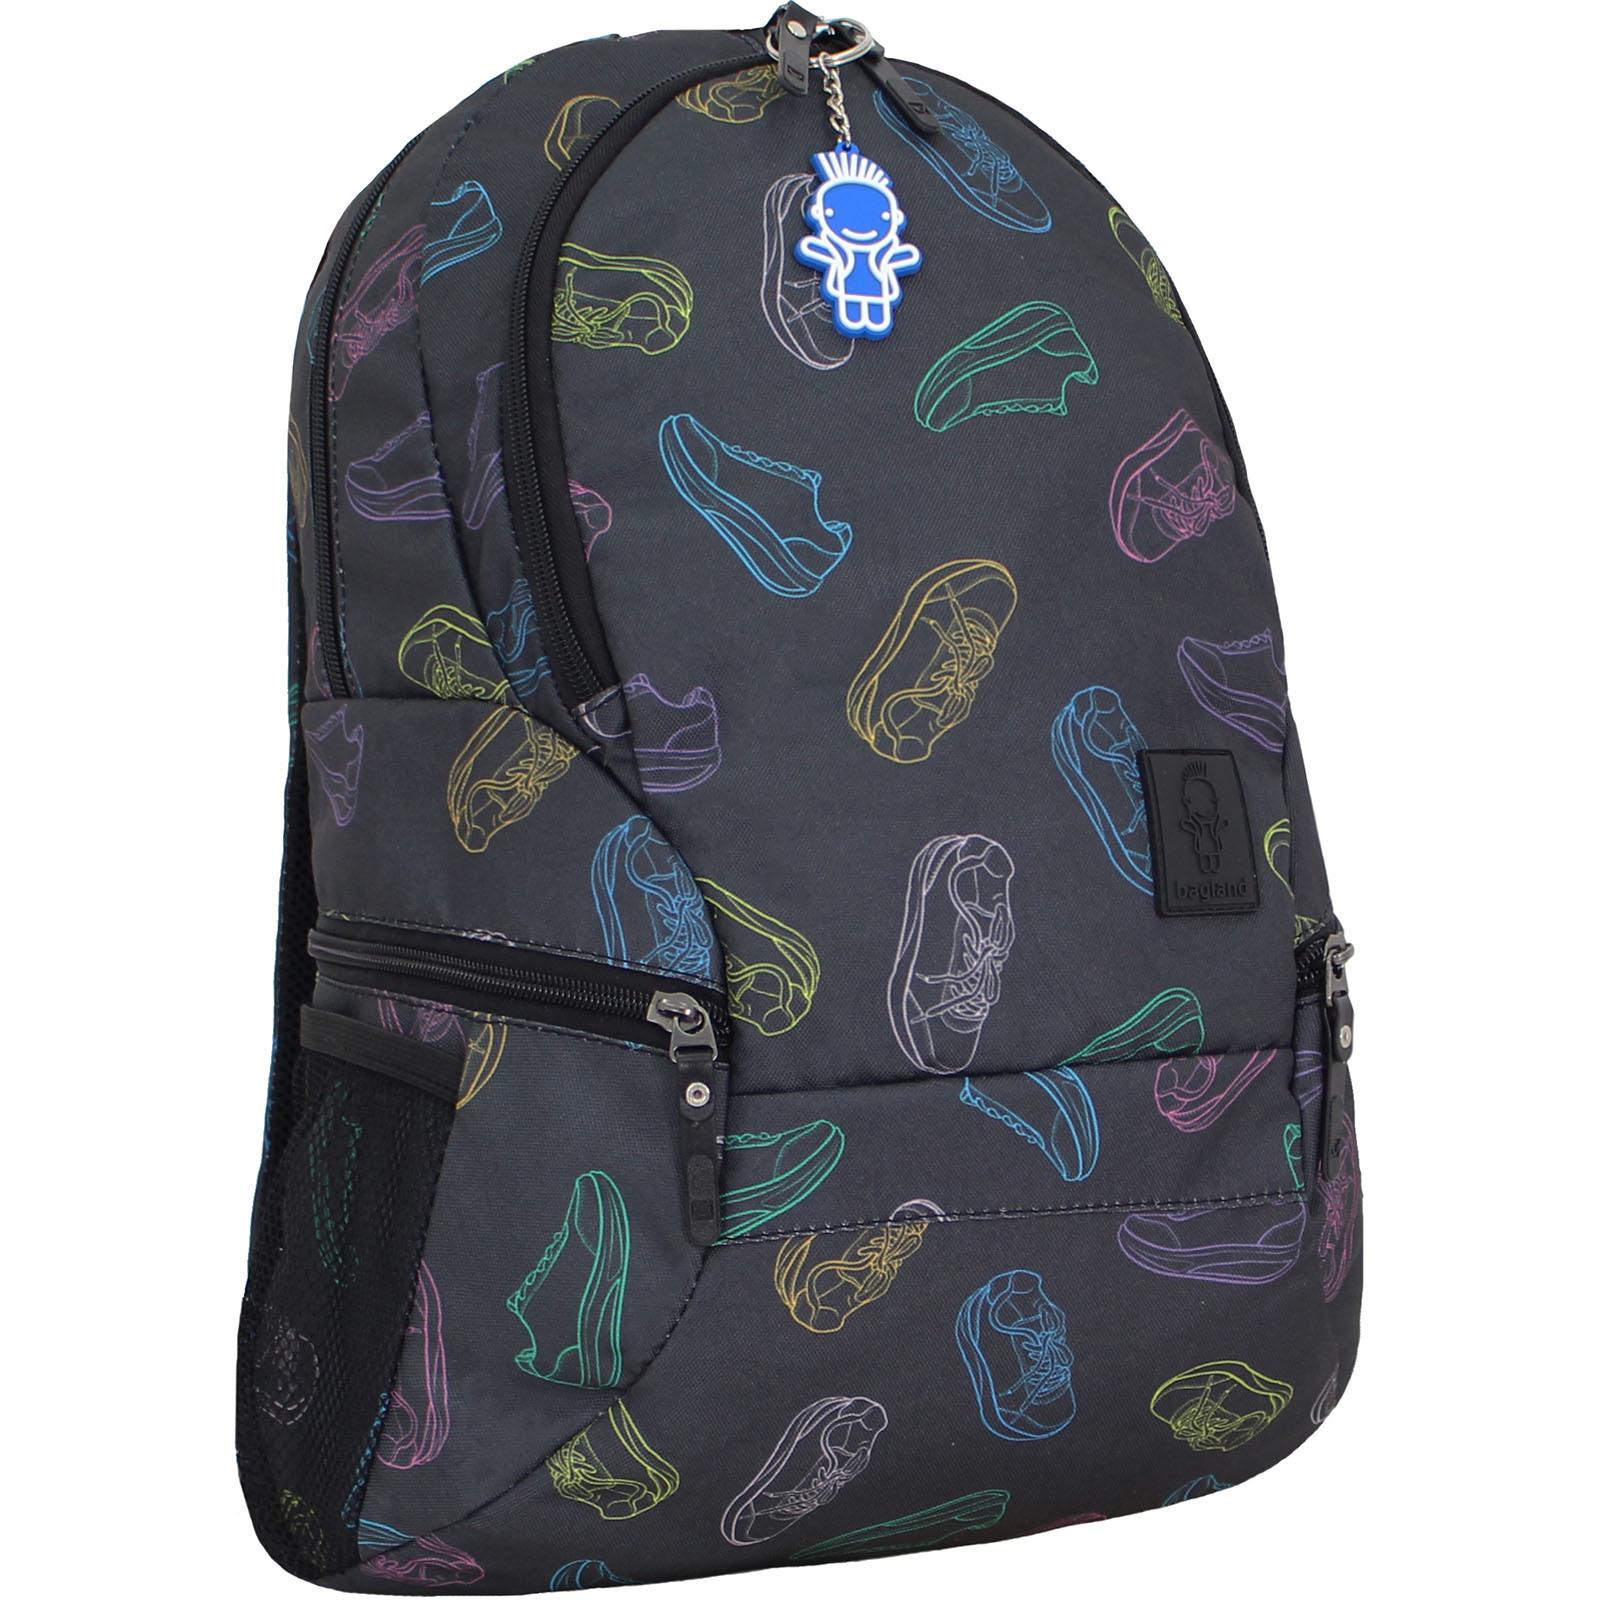 Городские рюкзаки Рюкзак Bagland Urban 20 л. сублімація 172 (00530664) IMG_0303.JPG